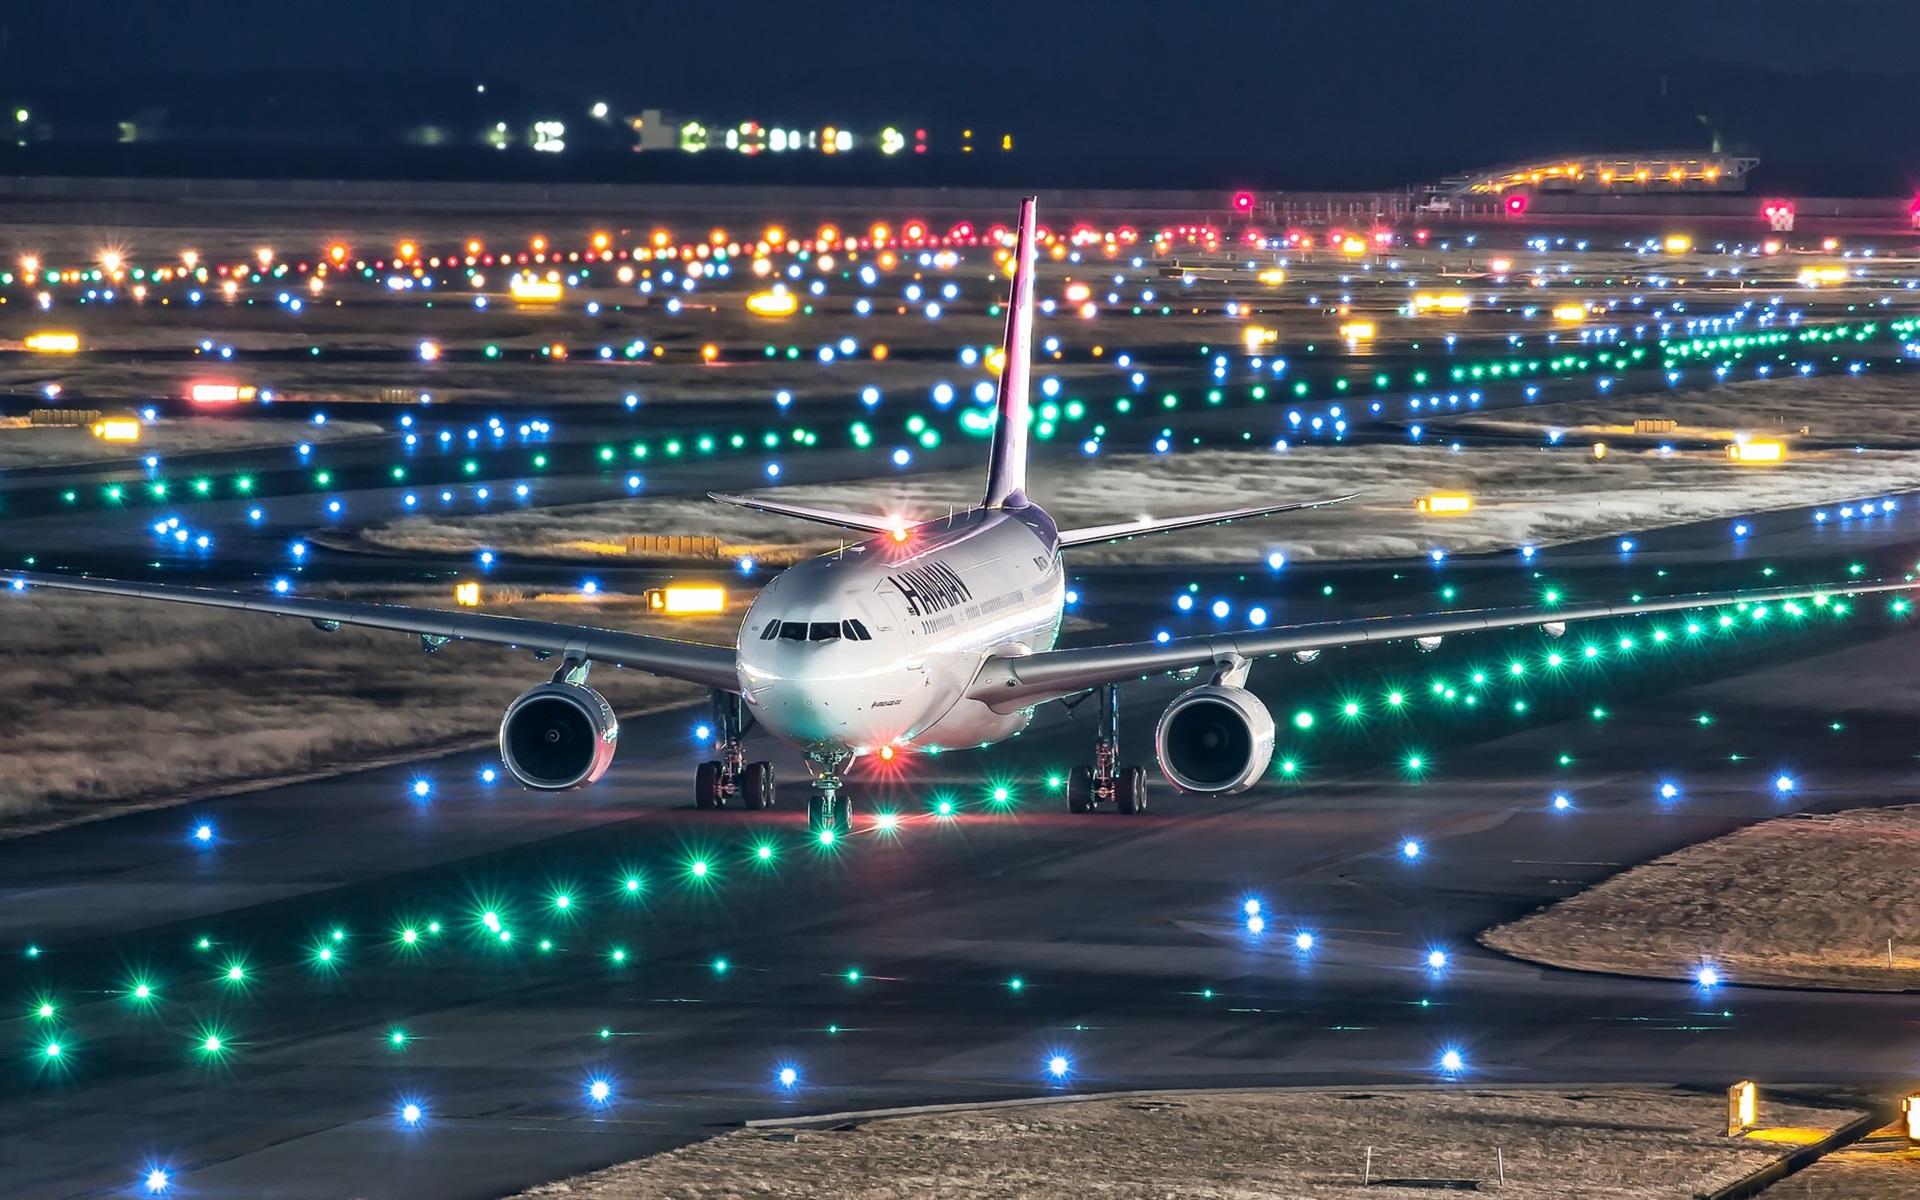 Картинки аэропорт ночью